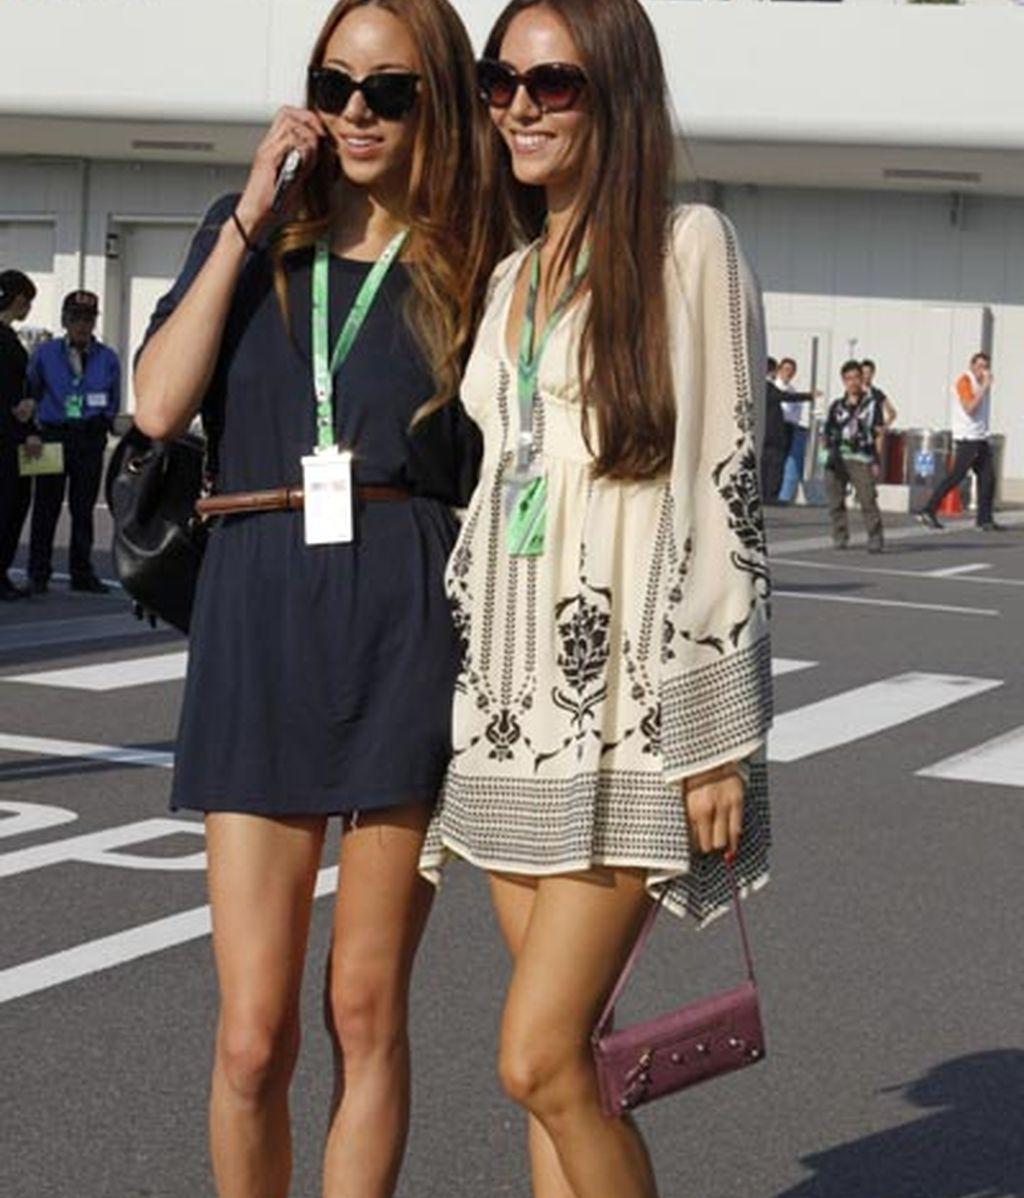 La modelo y novia de Vettel, Michibata, y su hermana